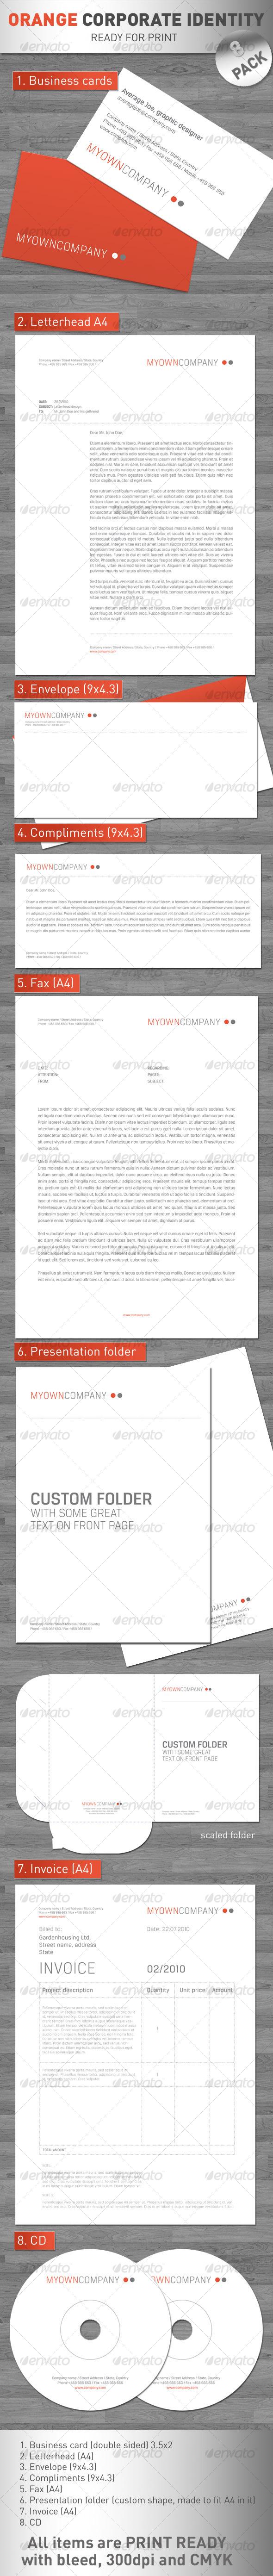 GraphicRiver Orange Coporate Identity 8 PACK 114773